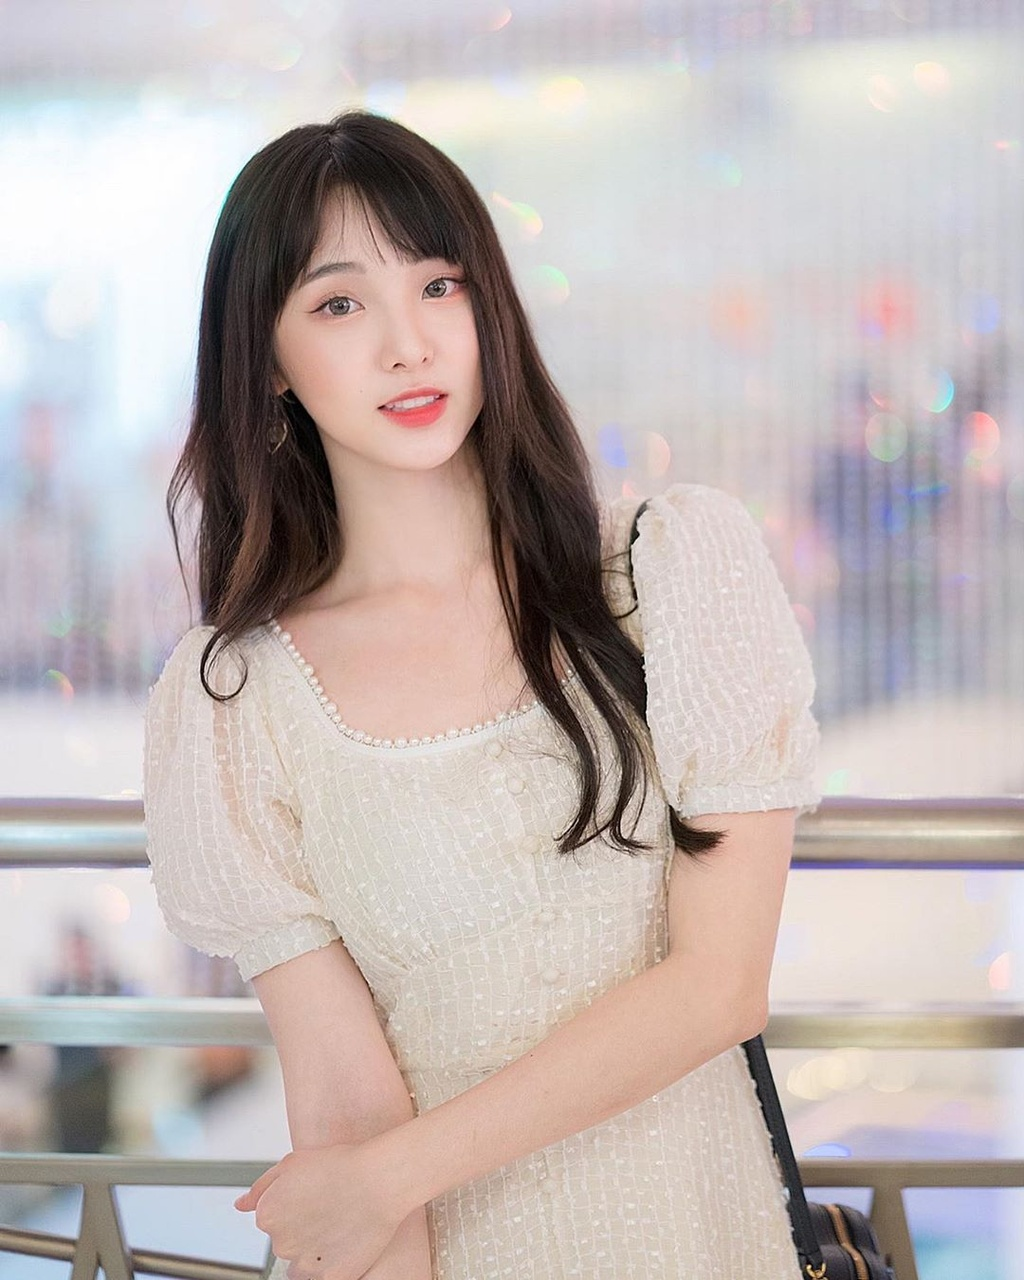 Hot girl 'Lat mat 3' cua Ly Hai tham gia show song con ban Trung hinh anh 9 83717783_1069578396735130_6460477066559533285_n.jpg